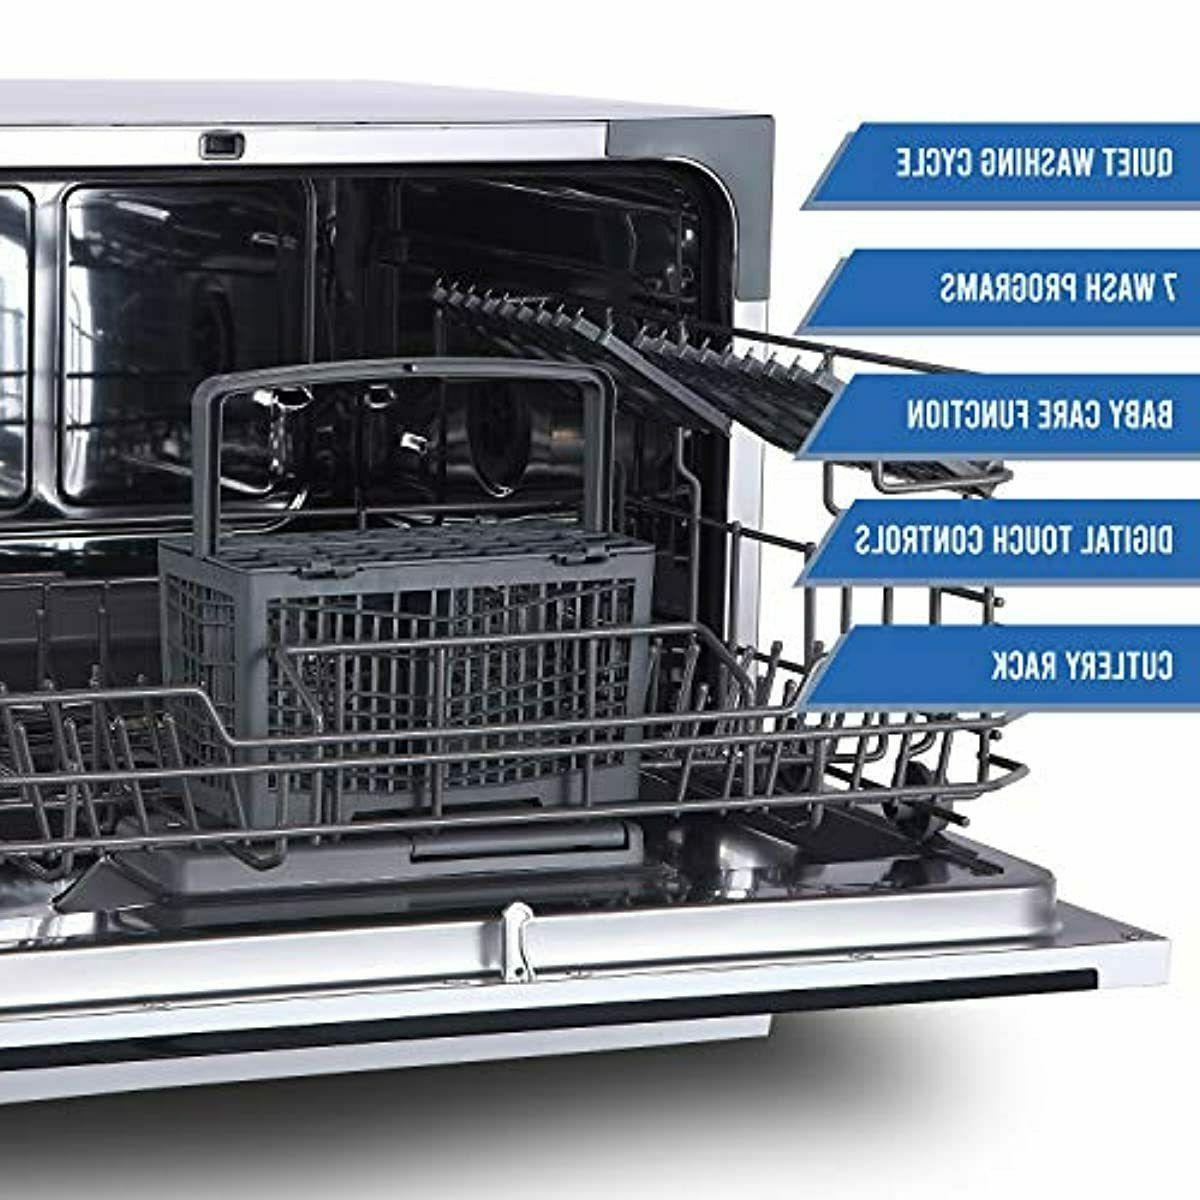 Professional Compact Dishwasher